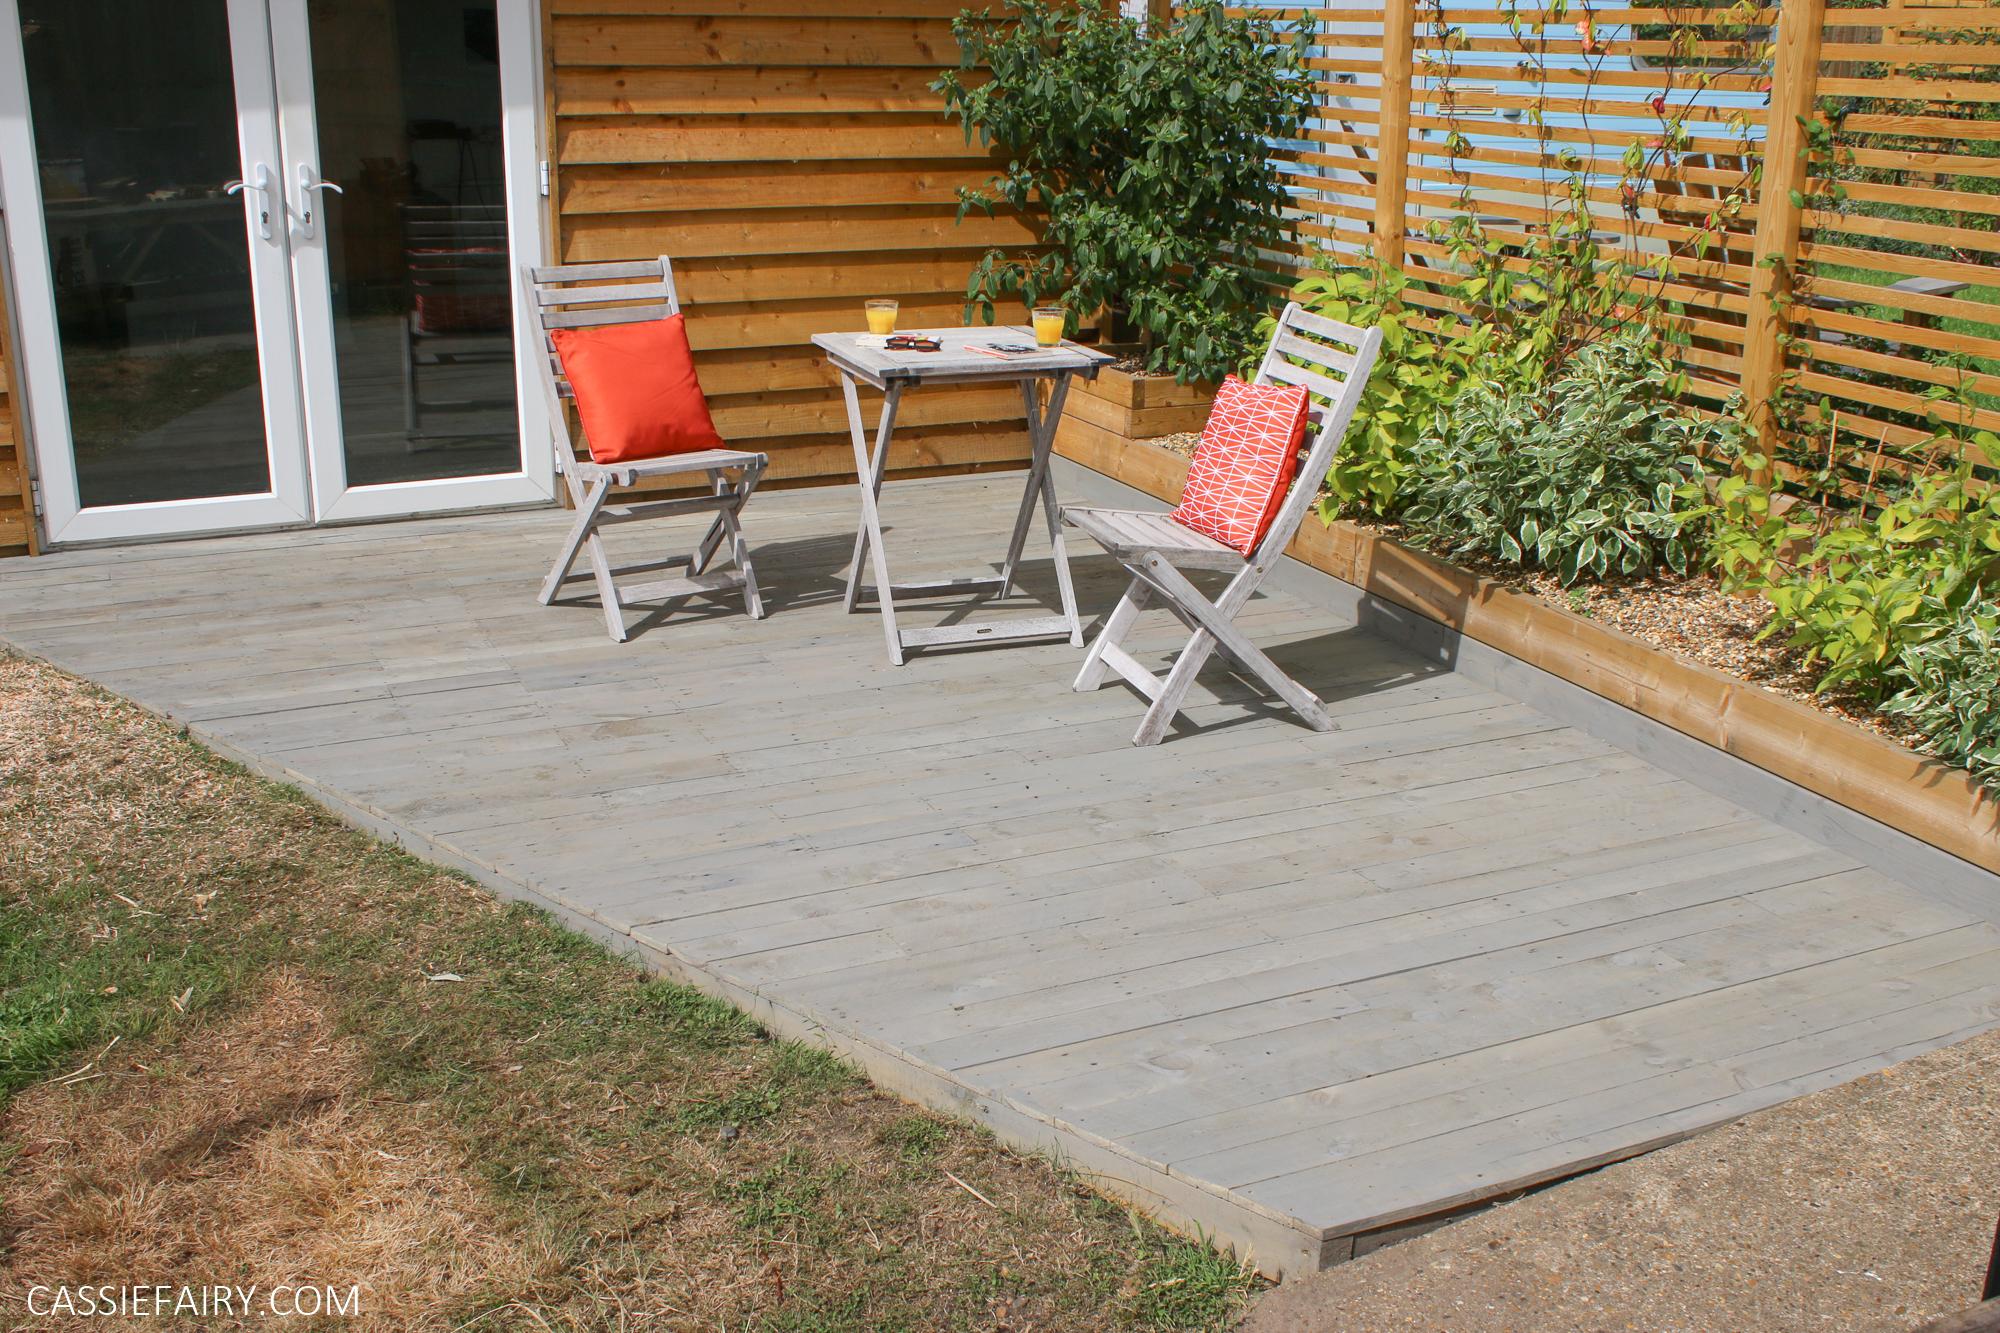 how to diy a garden deck using pallet wood